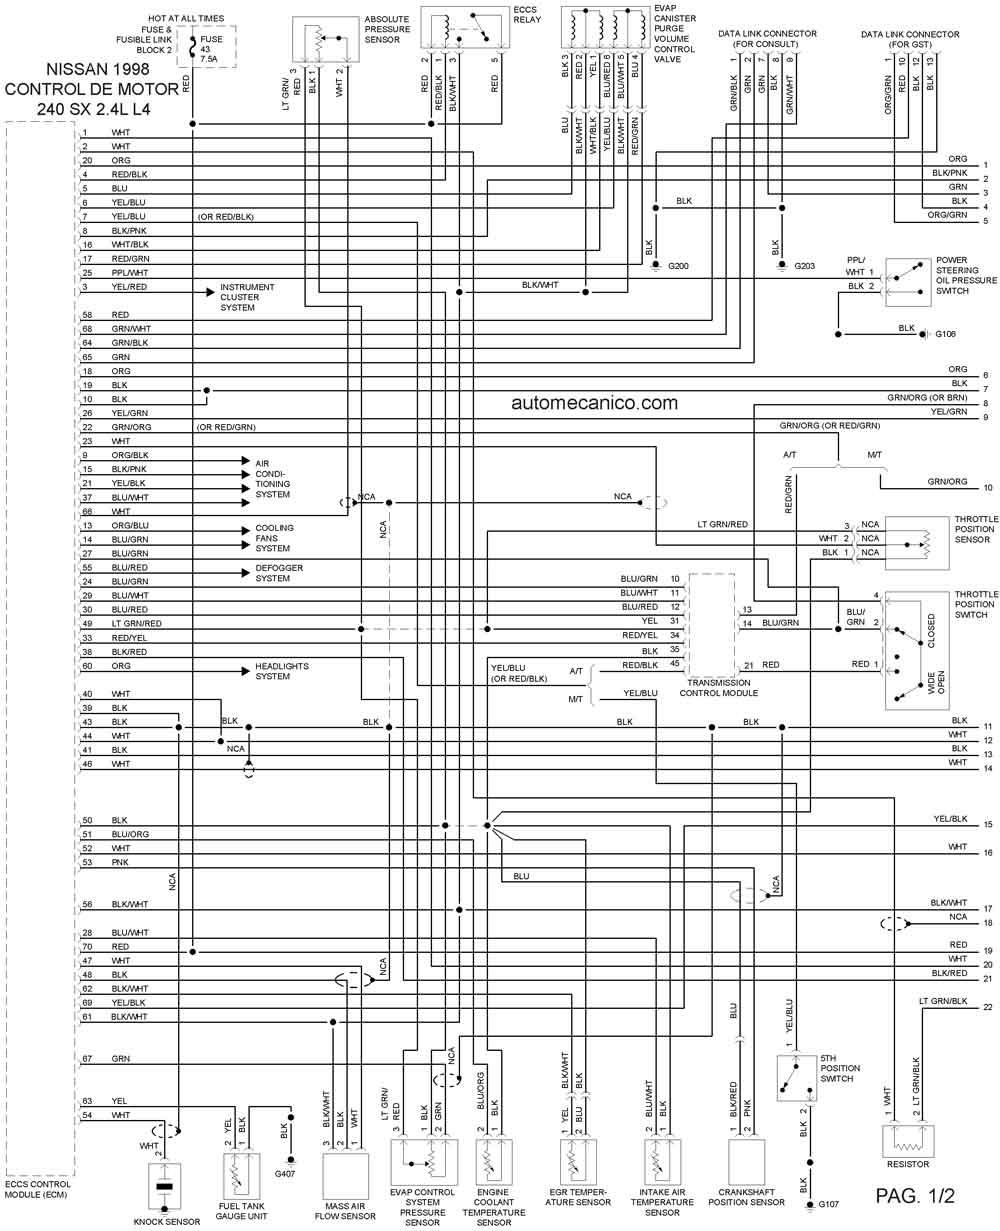 nissan d21 fuse box nissan almera fuse box wiring diagram